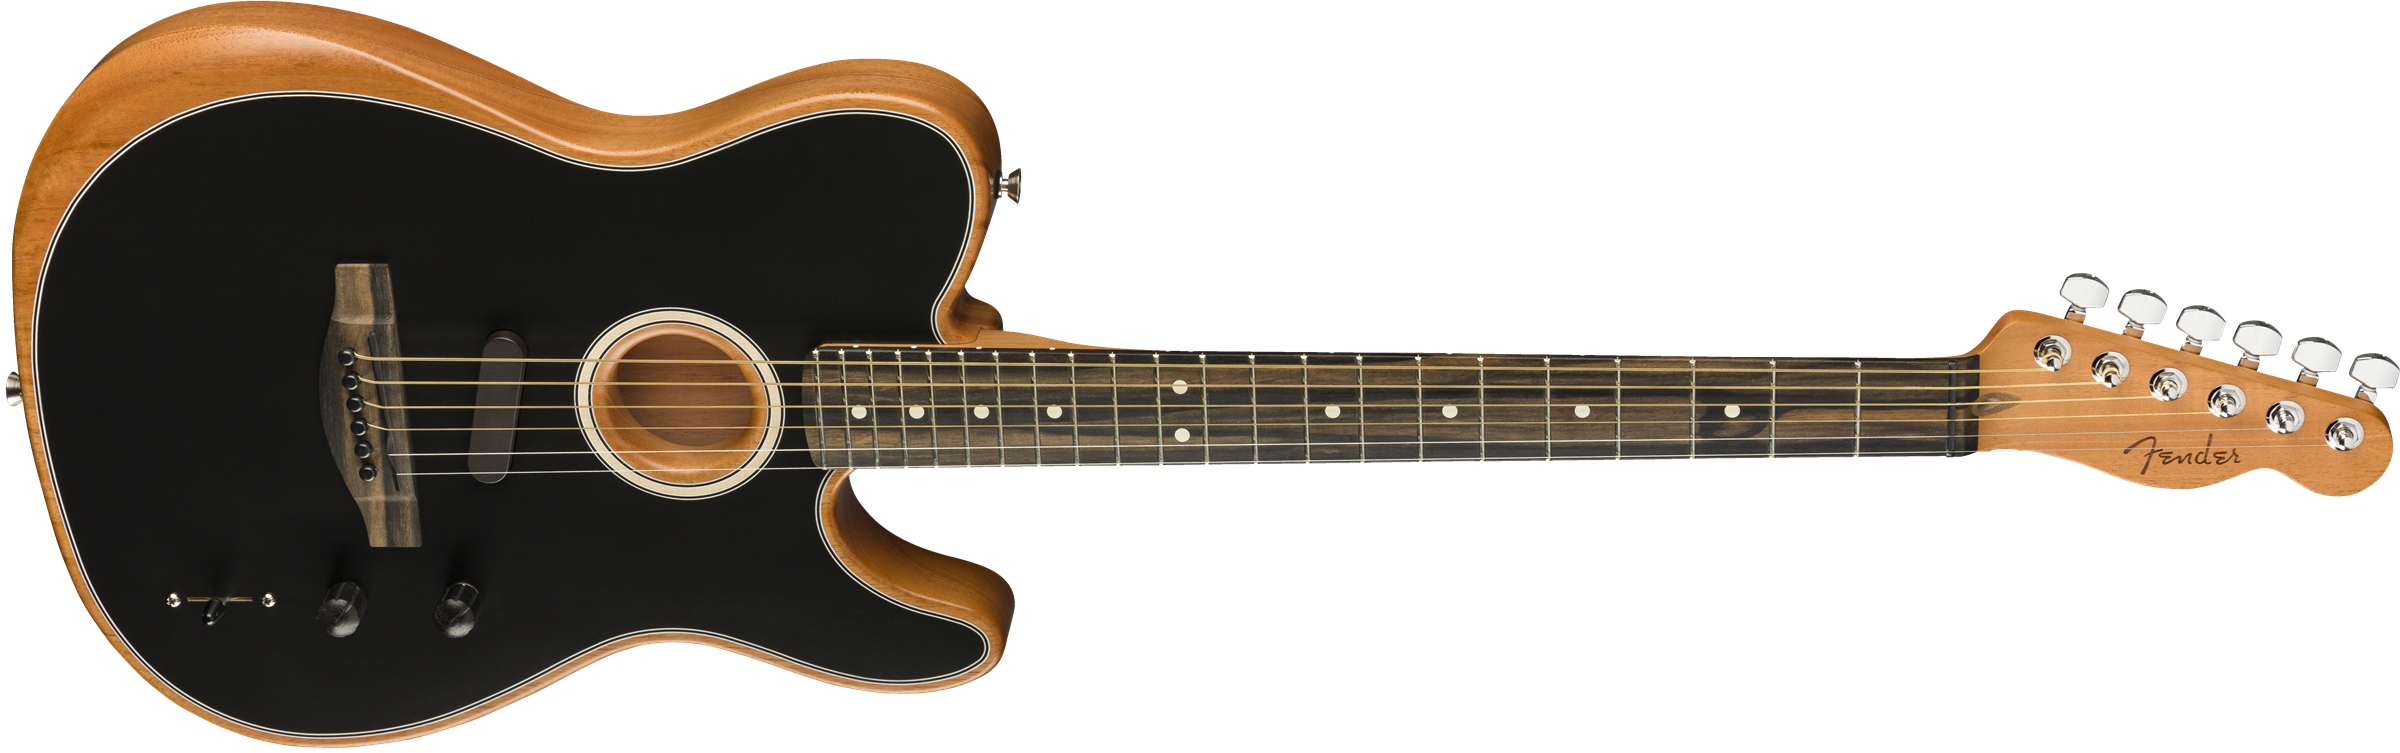 Fender American Acoustasonic® Telecaster®, Ebony Fingerboard, Black